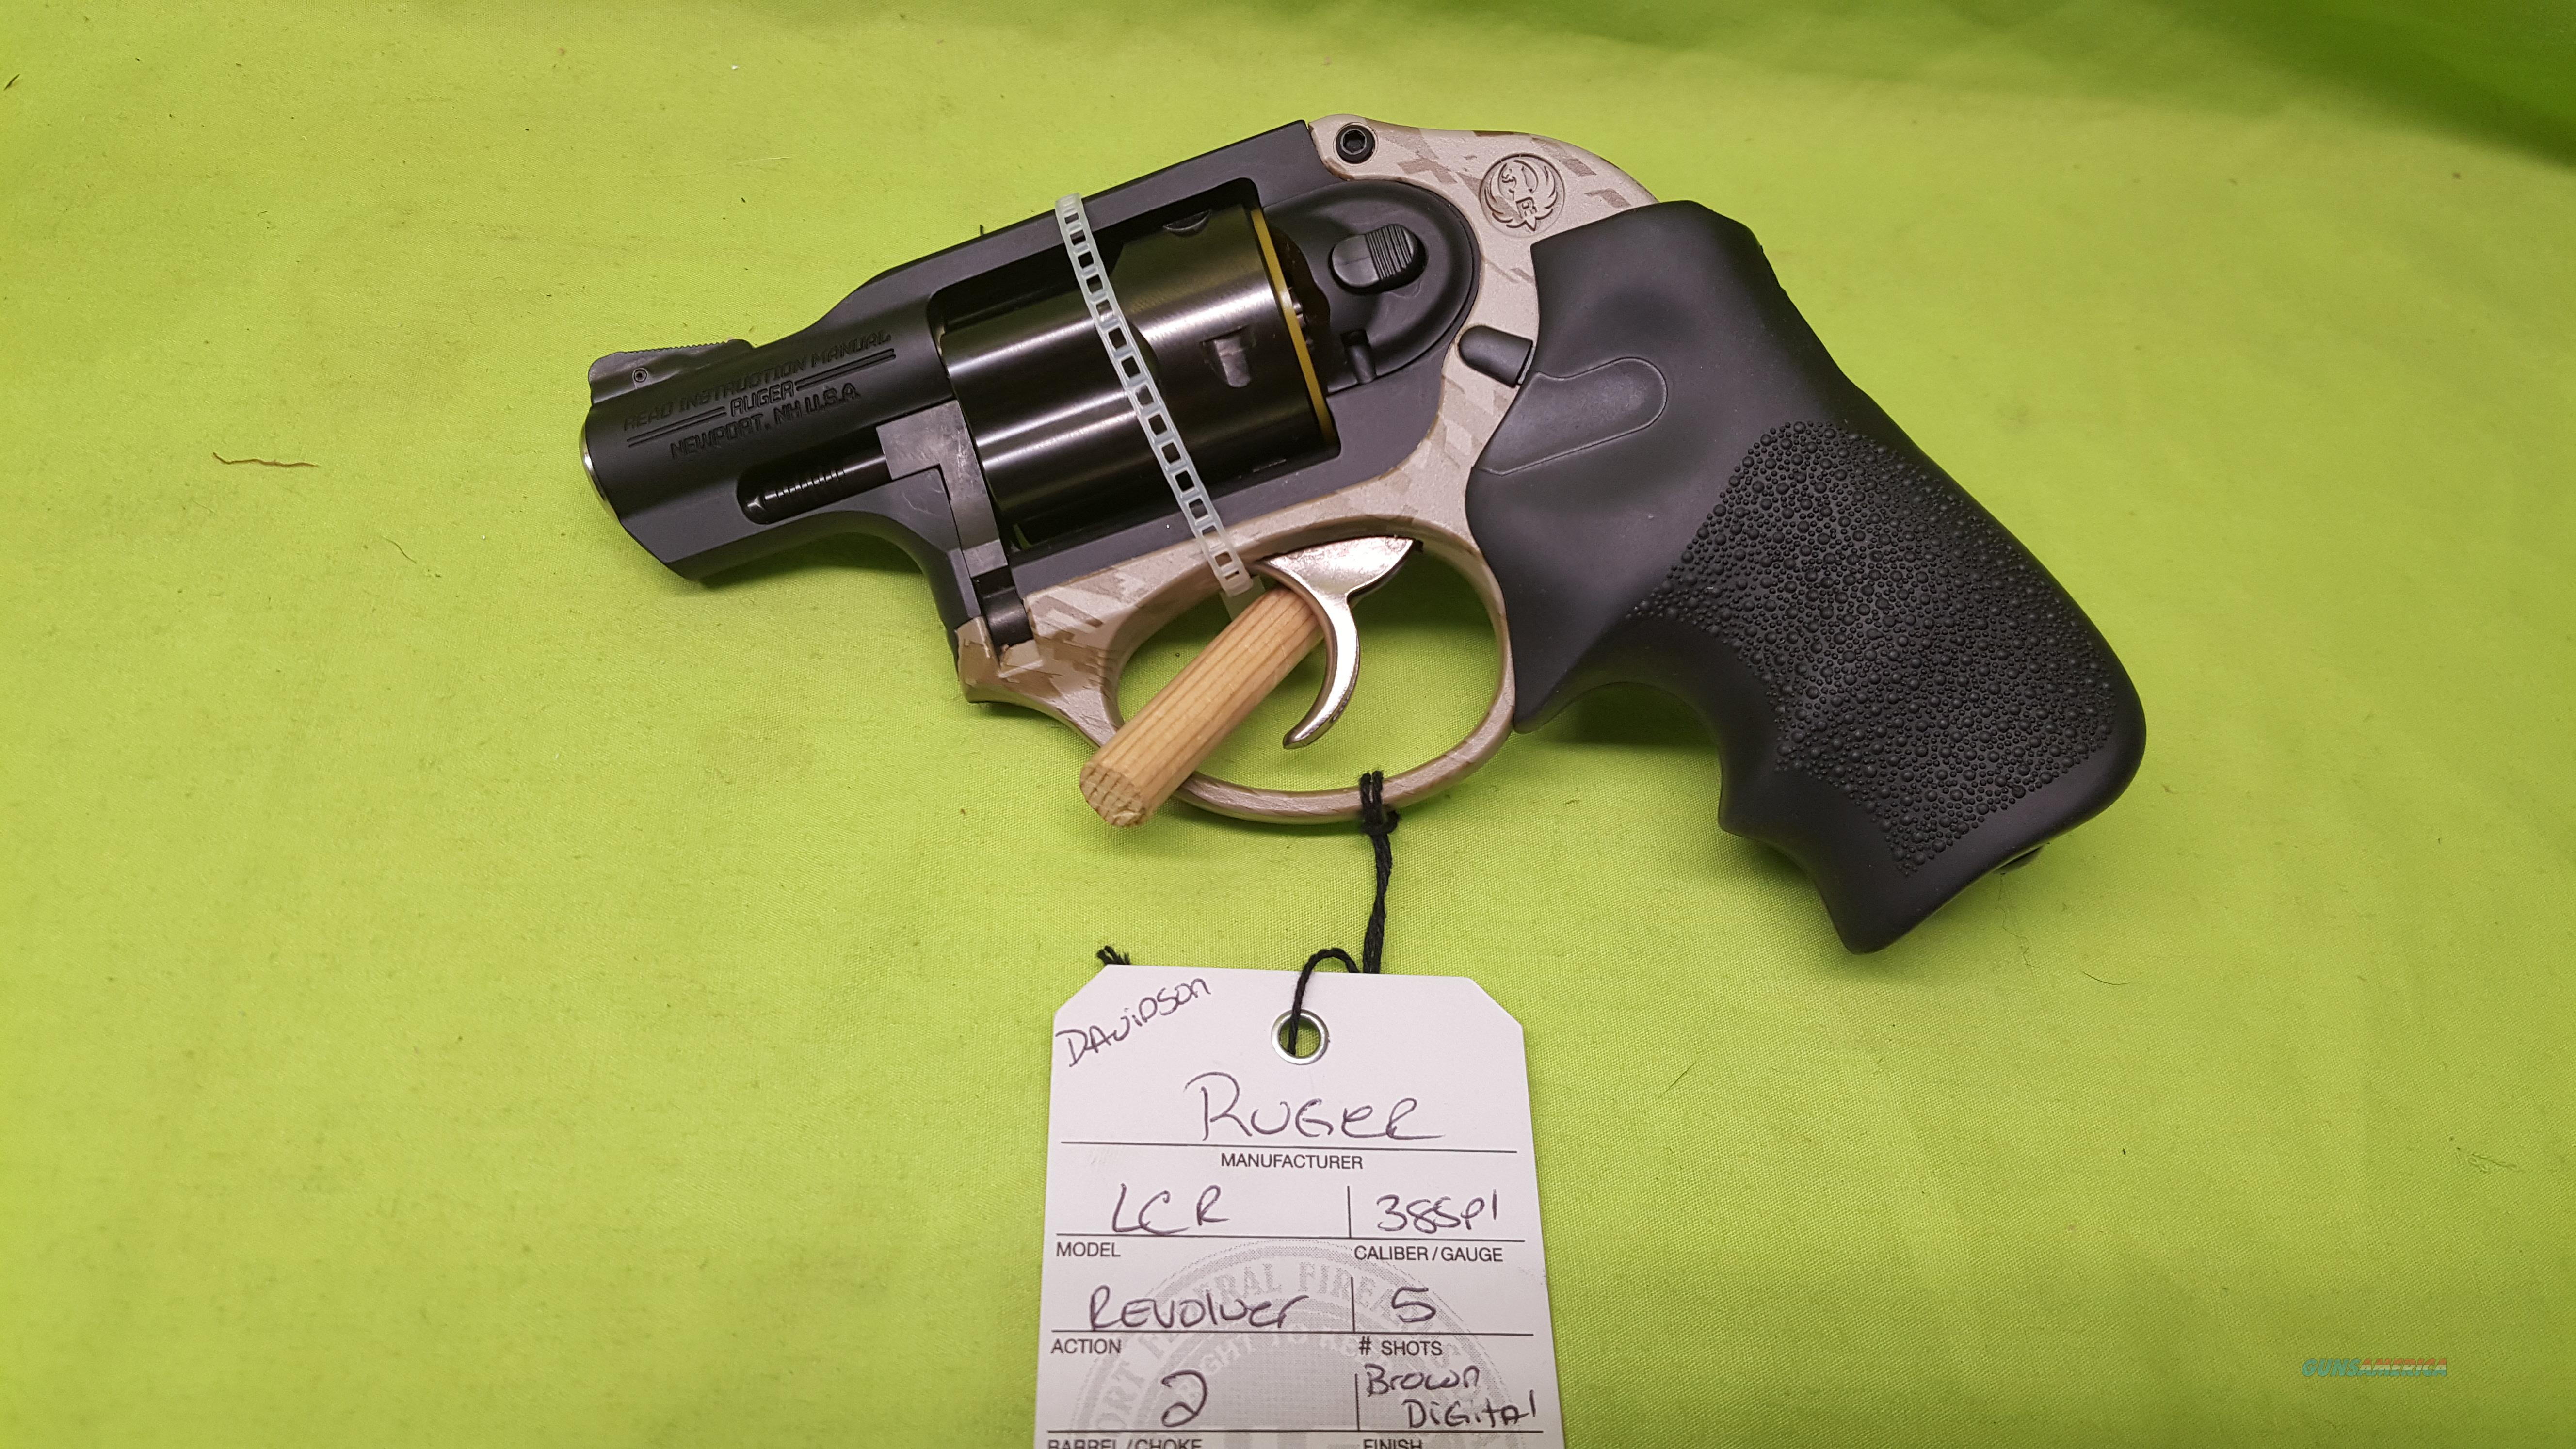 RUGER LCR 38 38SPL BROWN DIGITAL REVOLVER 5RD 5426  Guns > Pistols > Ruger Double Action Revolver > LCR